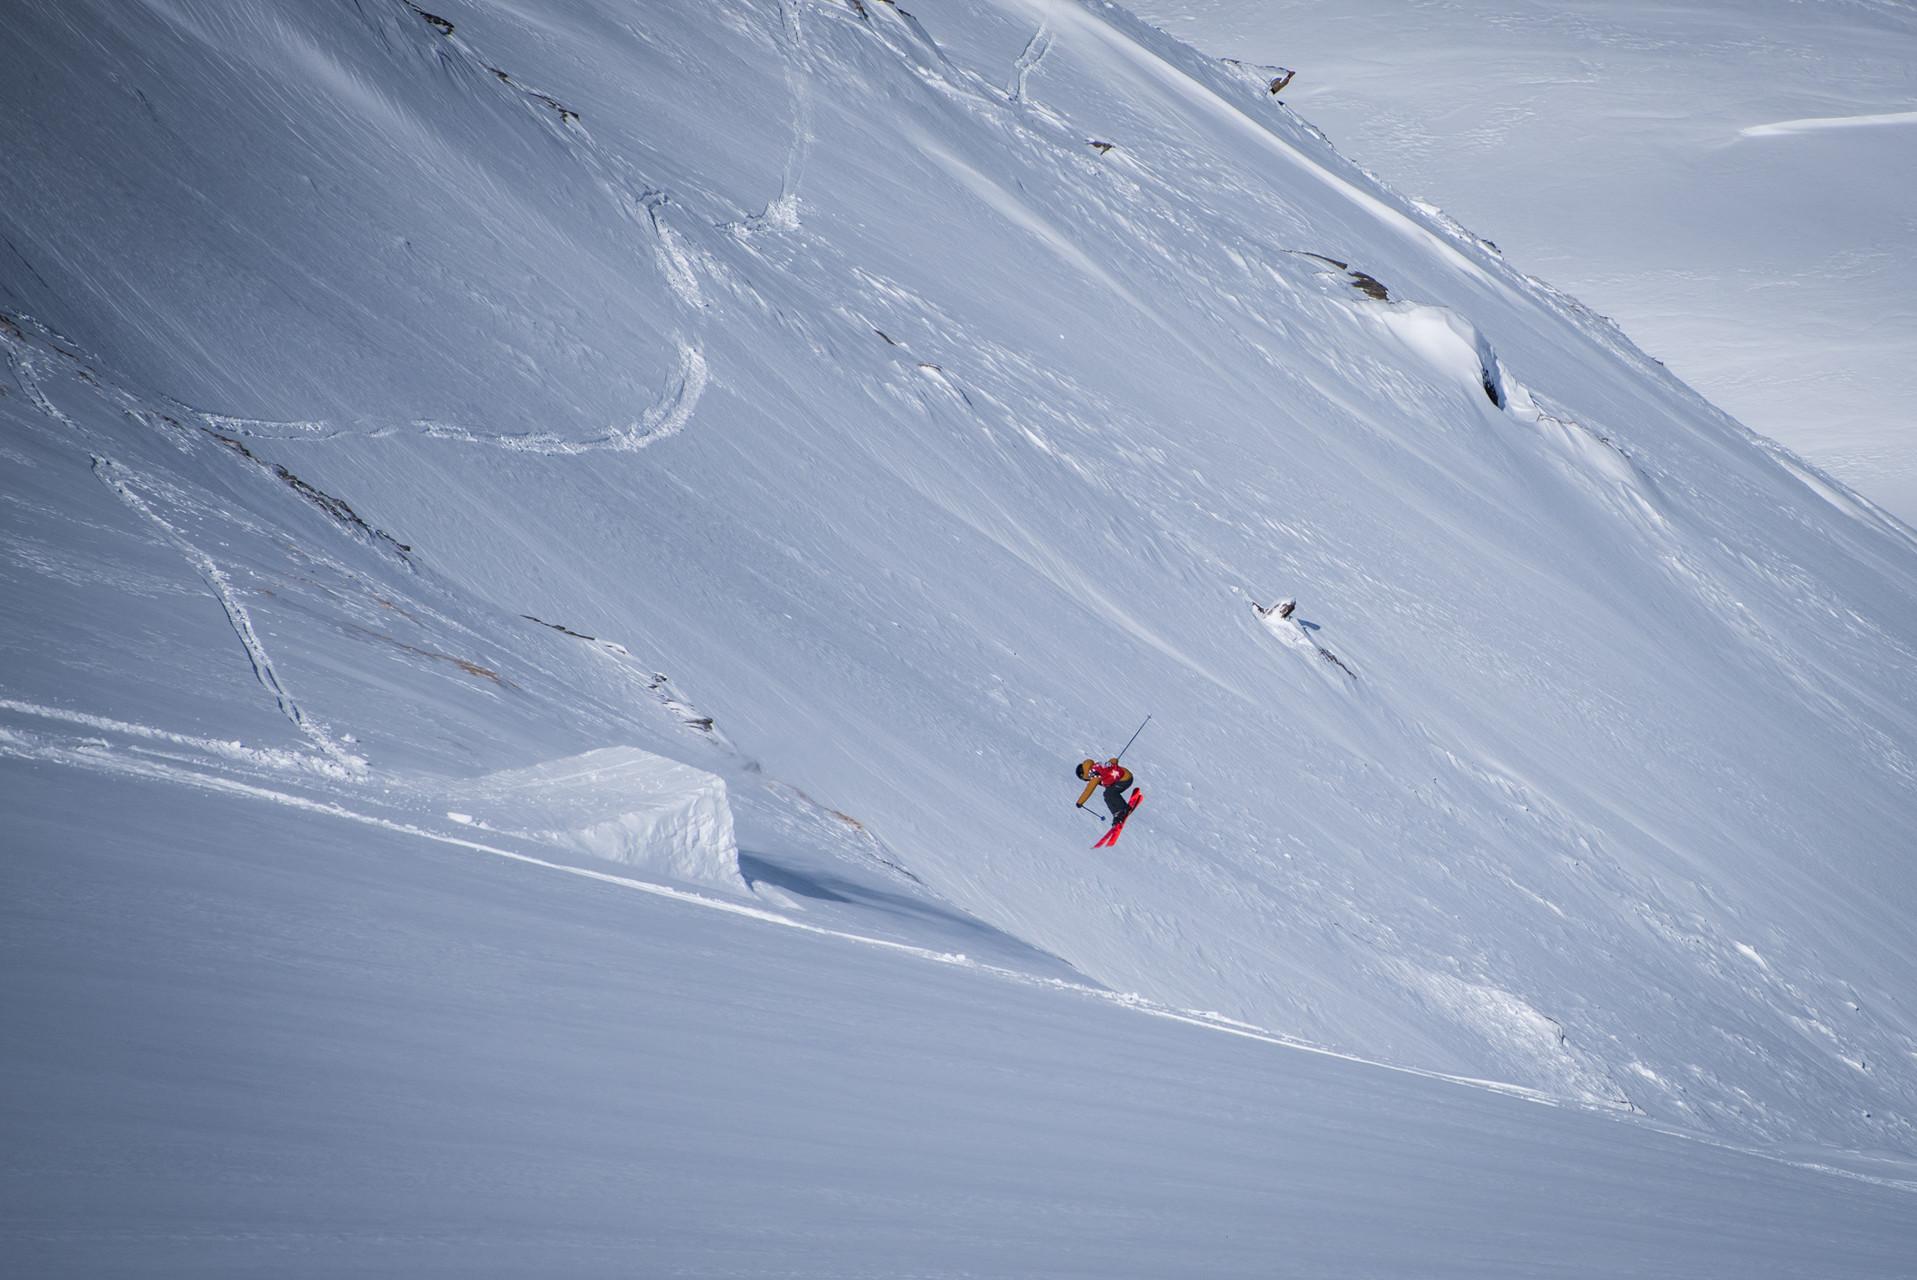 Credit: skierscup.com/ Davird Carlier